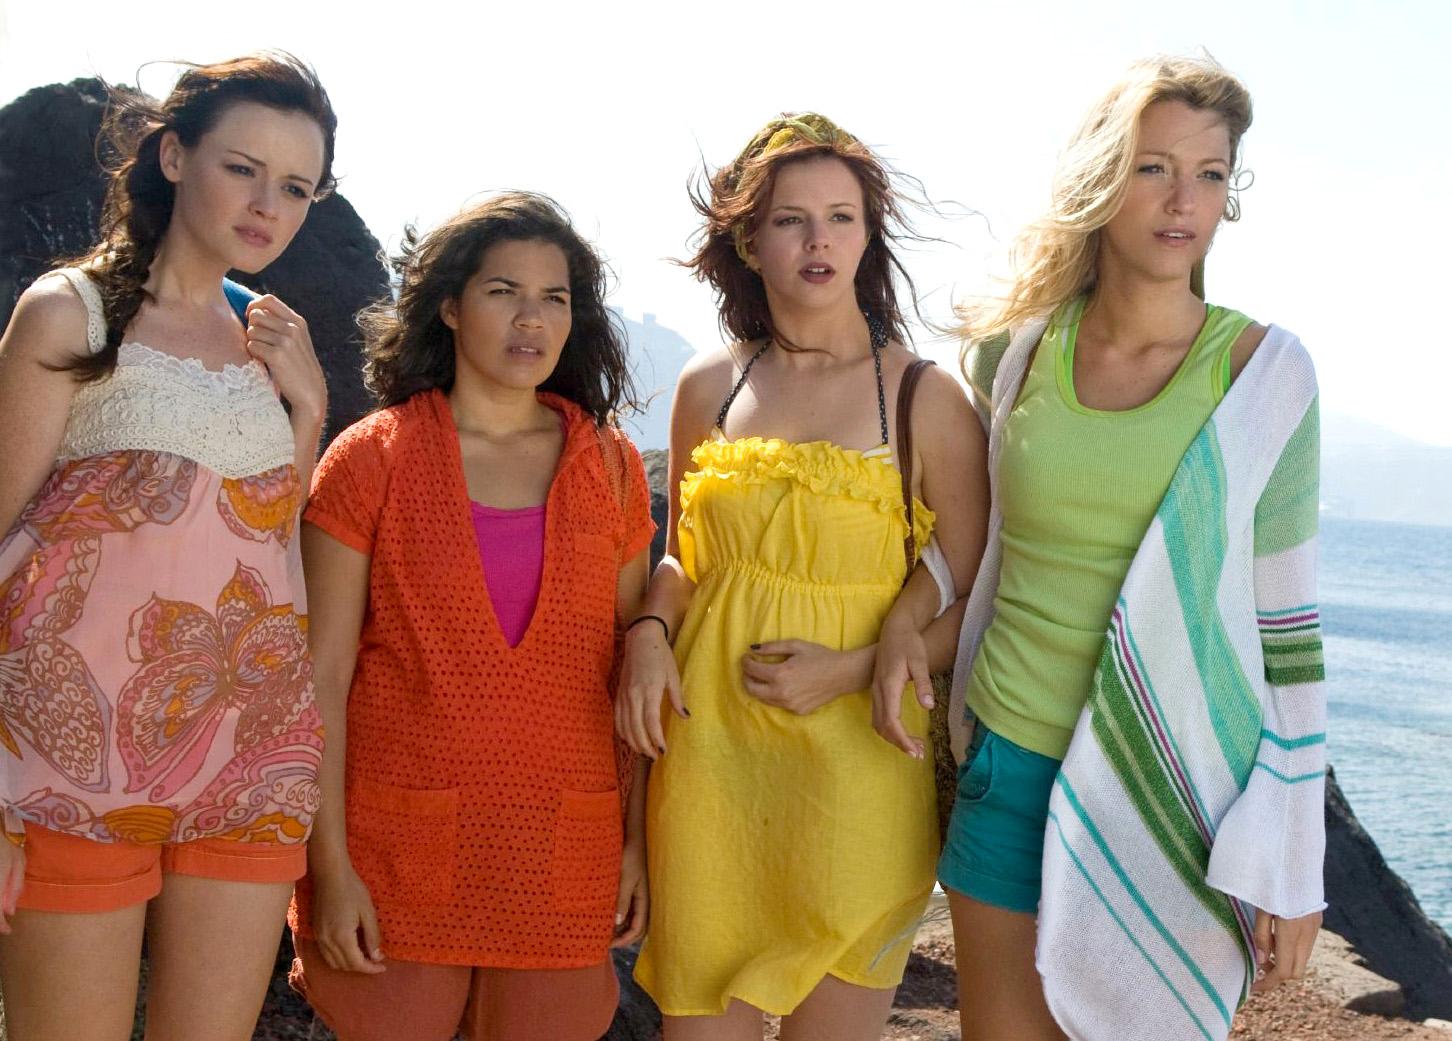 Amazon.com: The Sisterhood of the Traveling Pants 2 ...